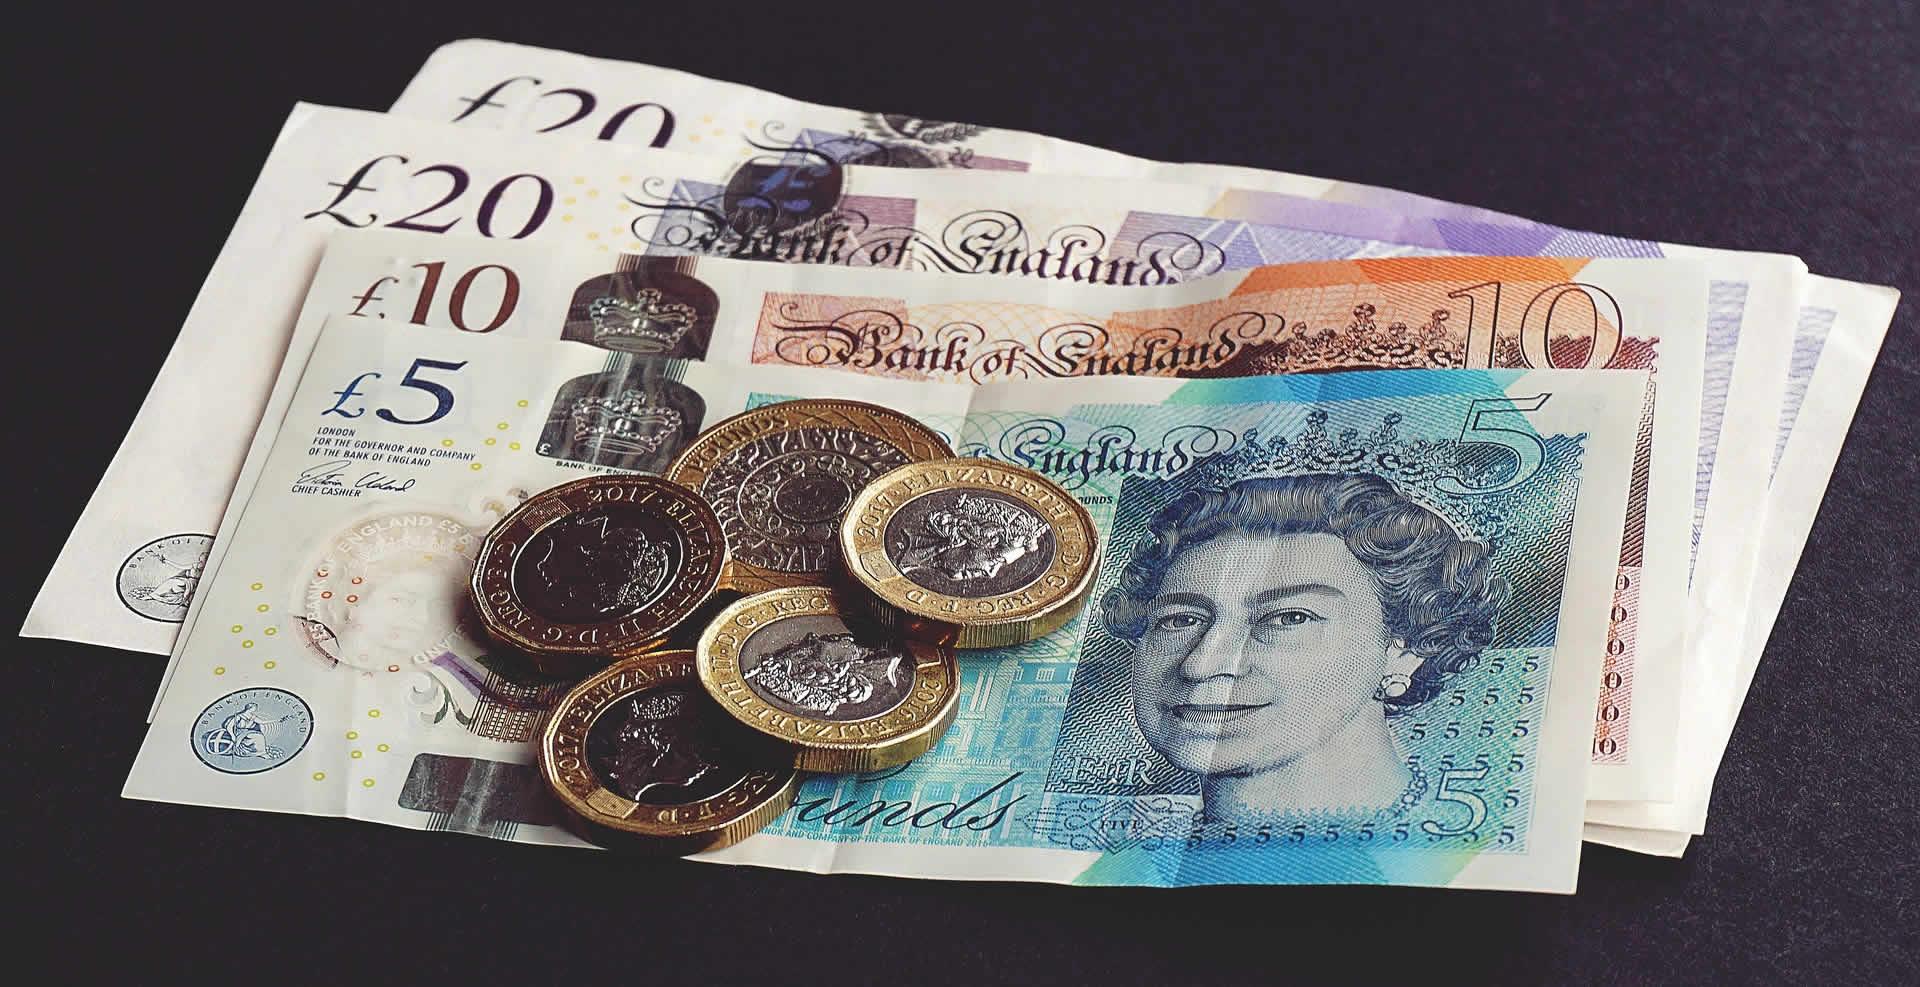 Money - British Pounds